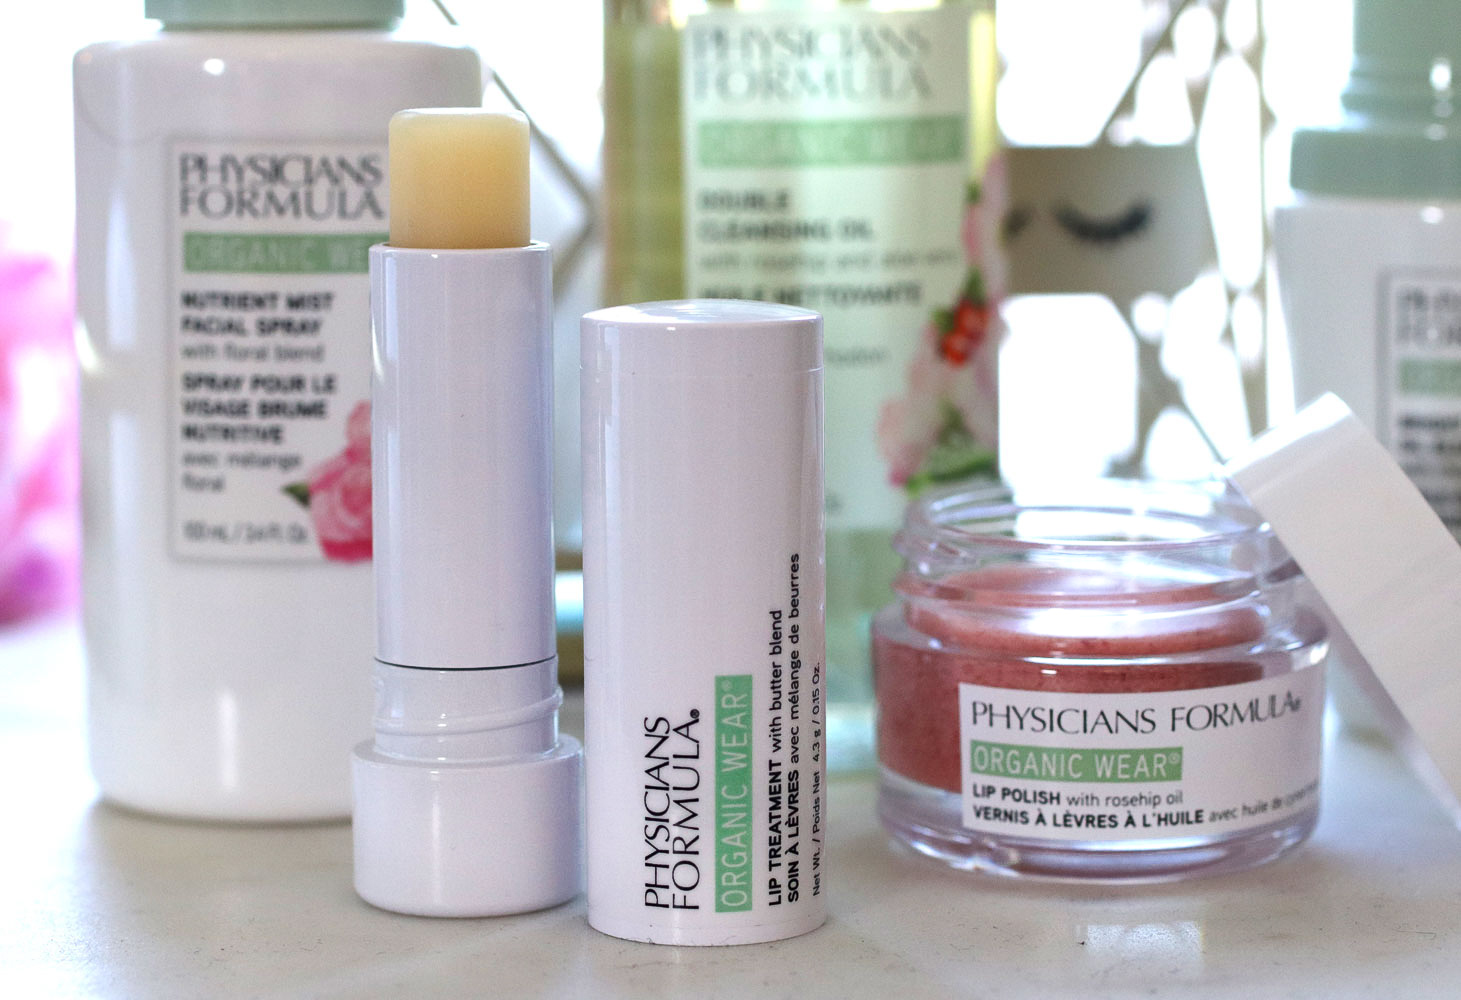 Physicians Formula Organic Wear Lip Treatment and Lip Polish